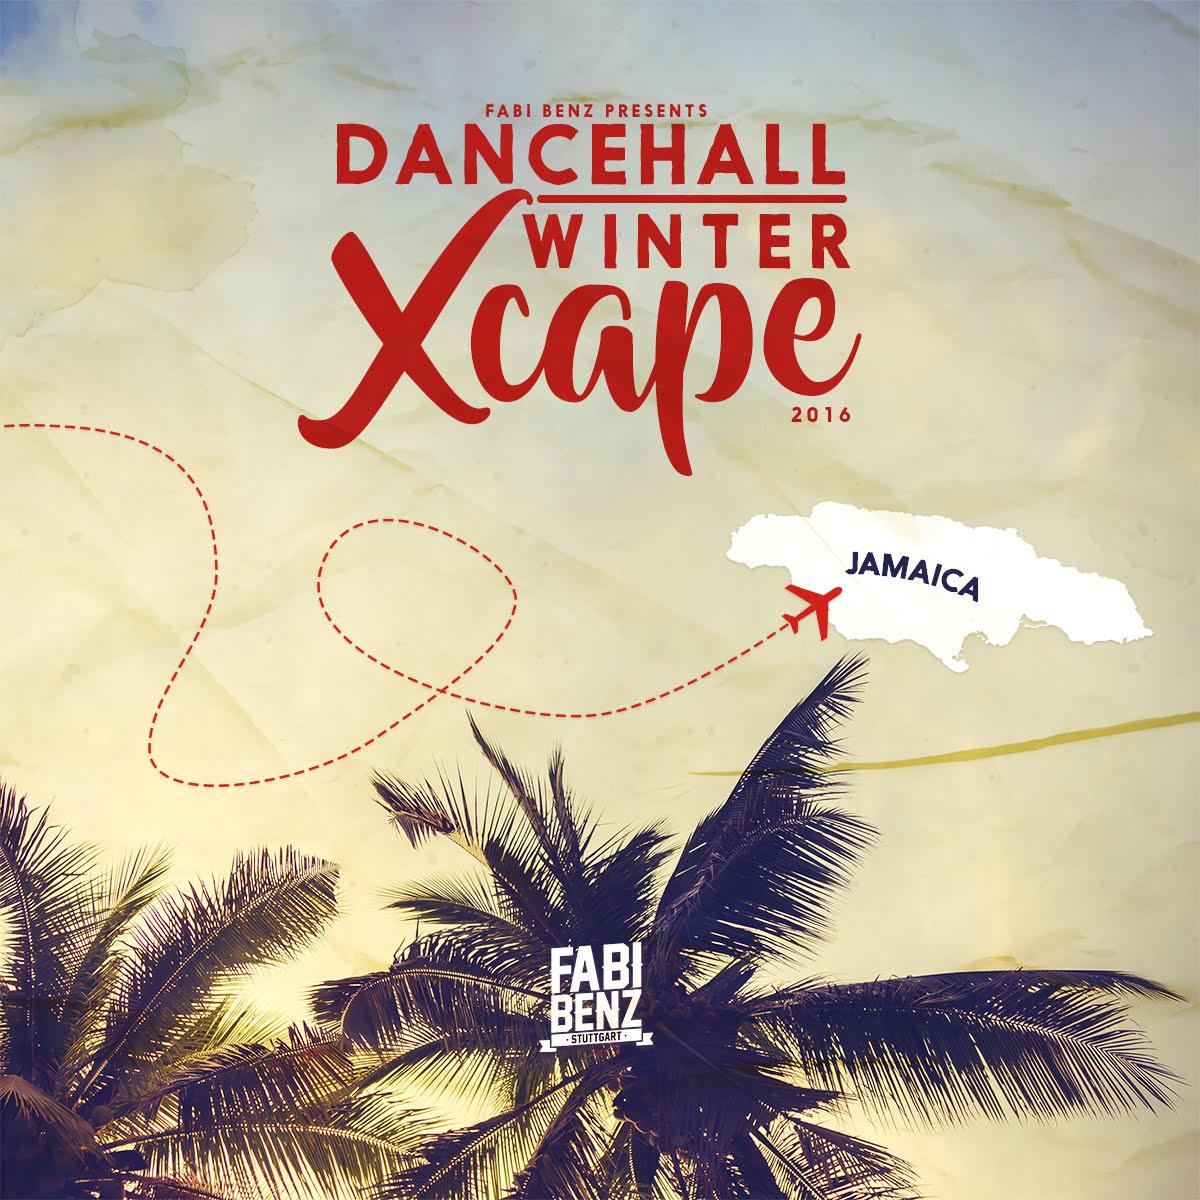 Dancehall Winter Xcape Mix (explicit) mixed by Fabi Benz